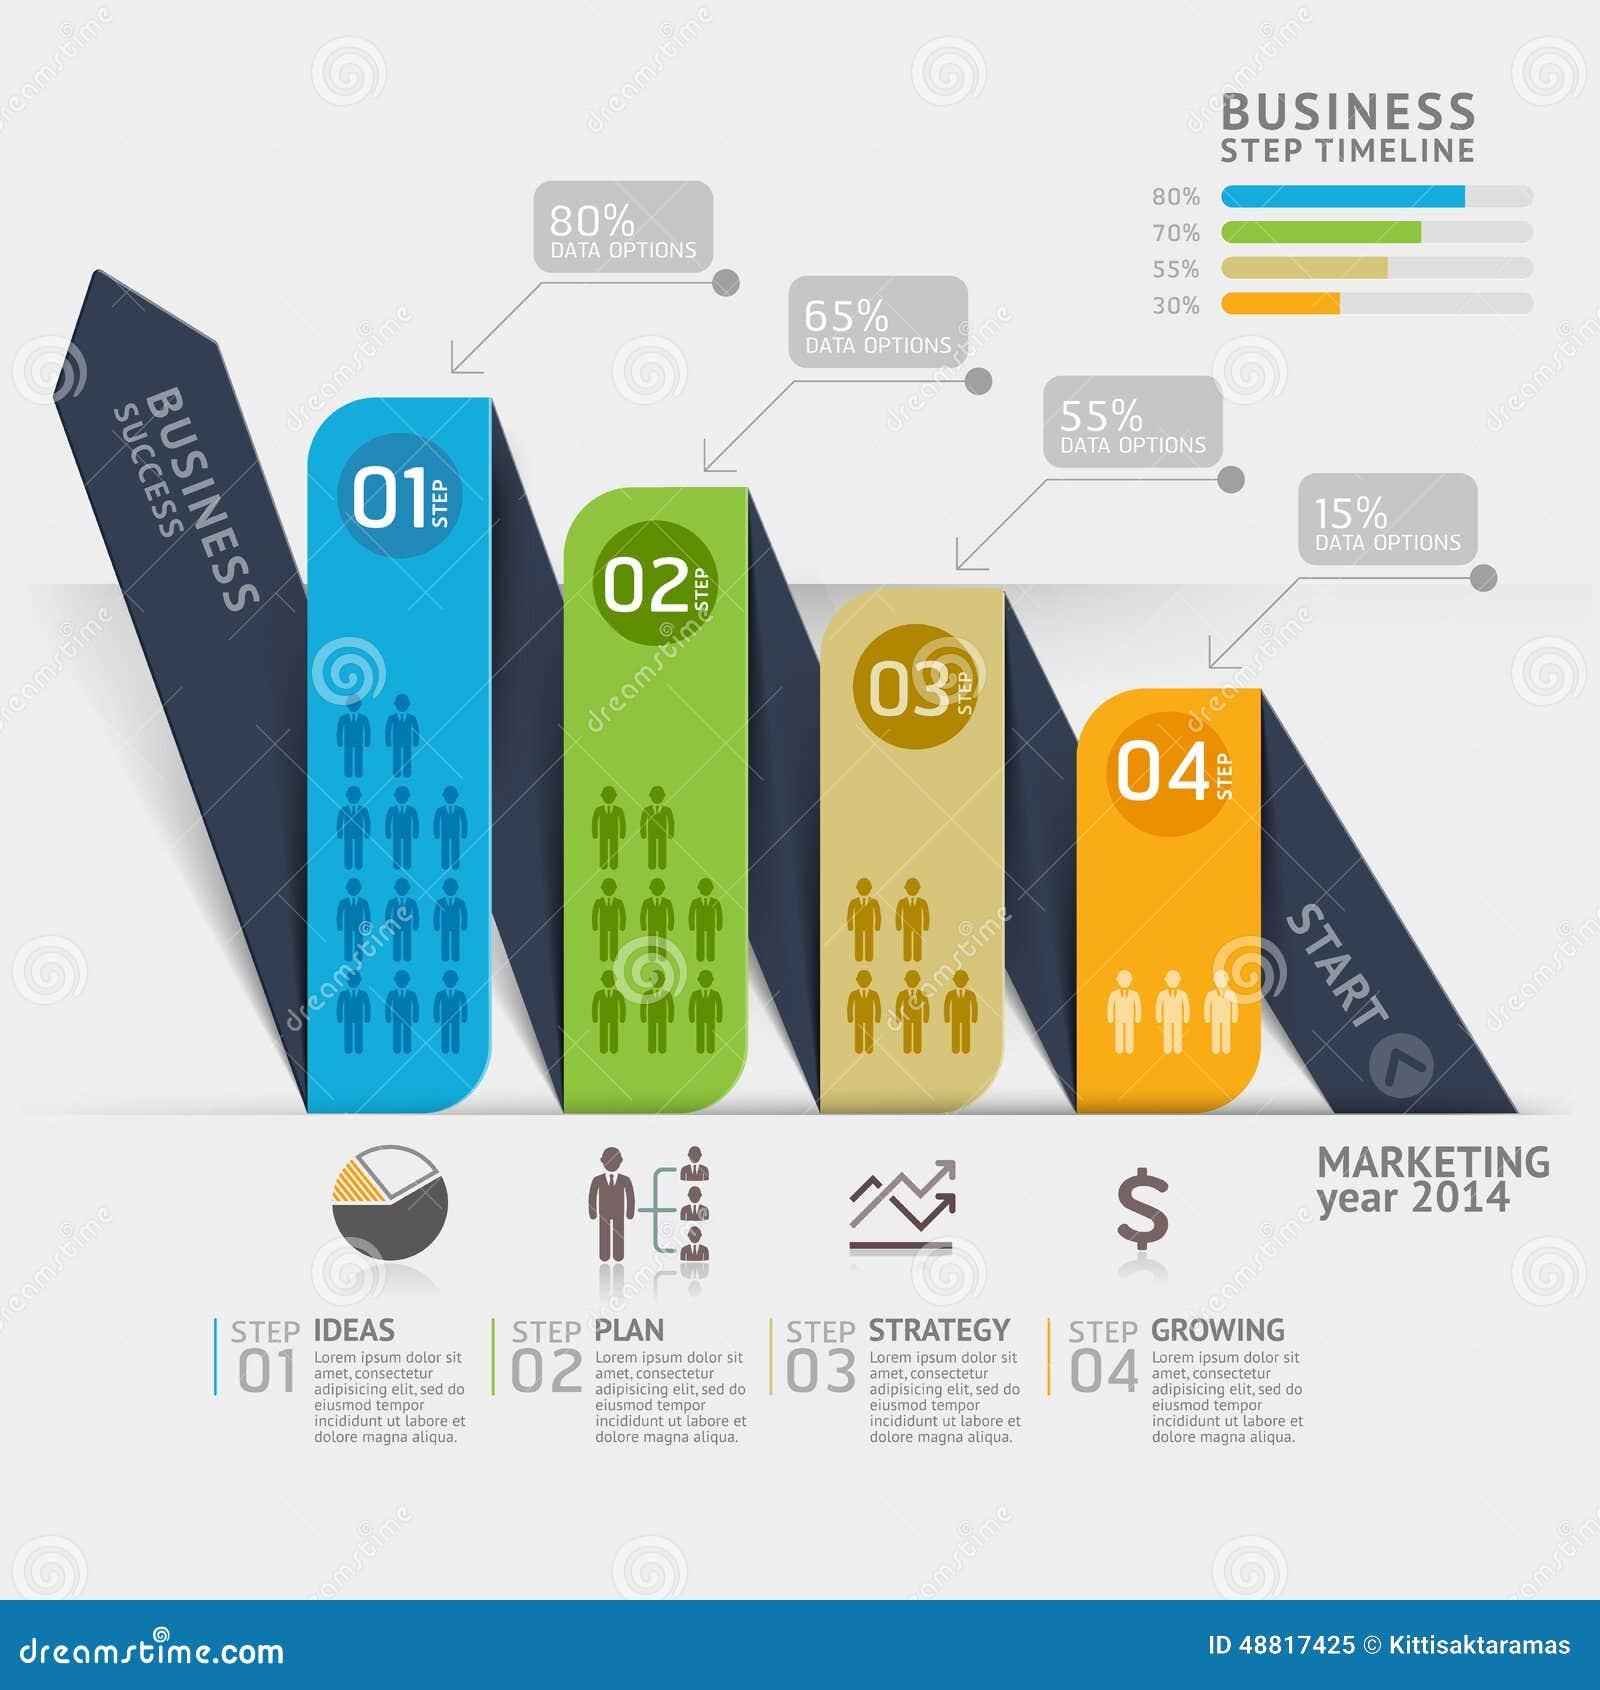 Business Marketing Arrow Timeline Template Vector Image – Marketing Timeline Template